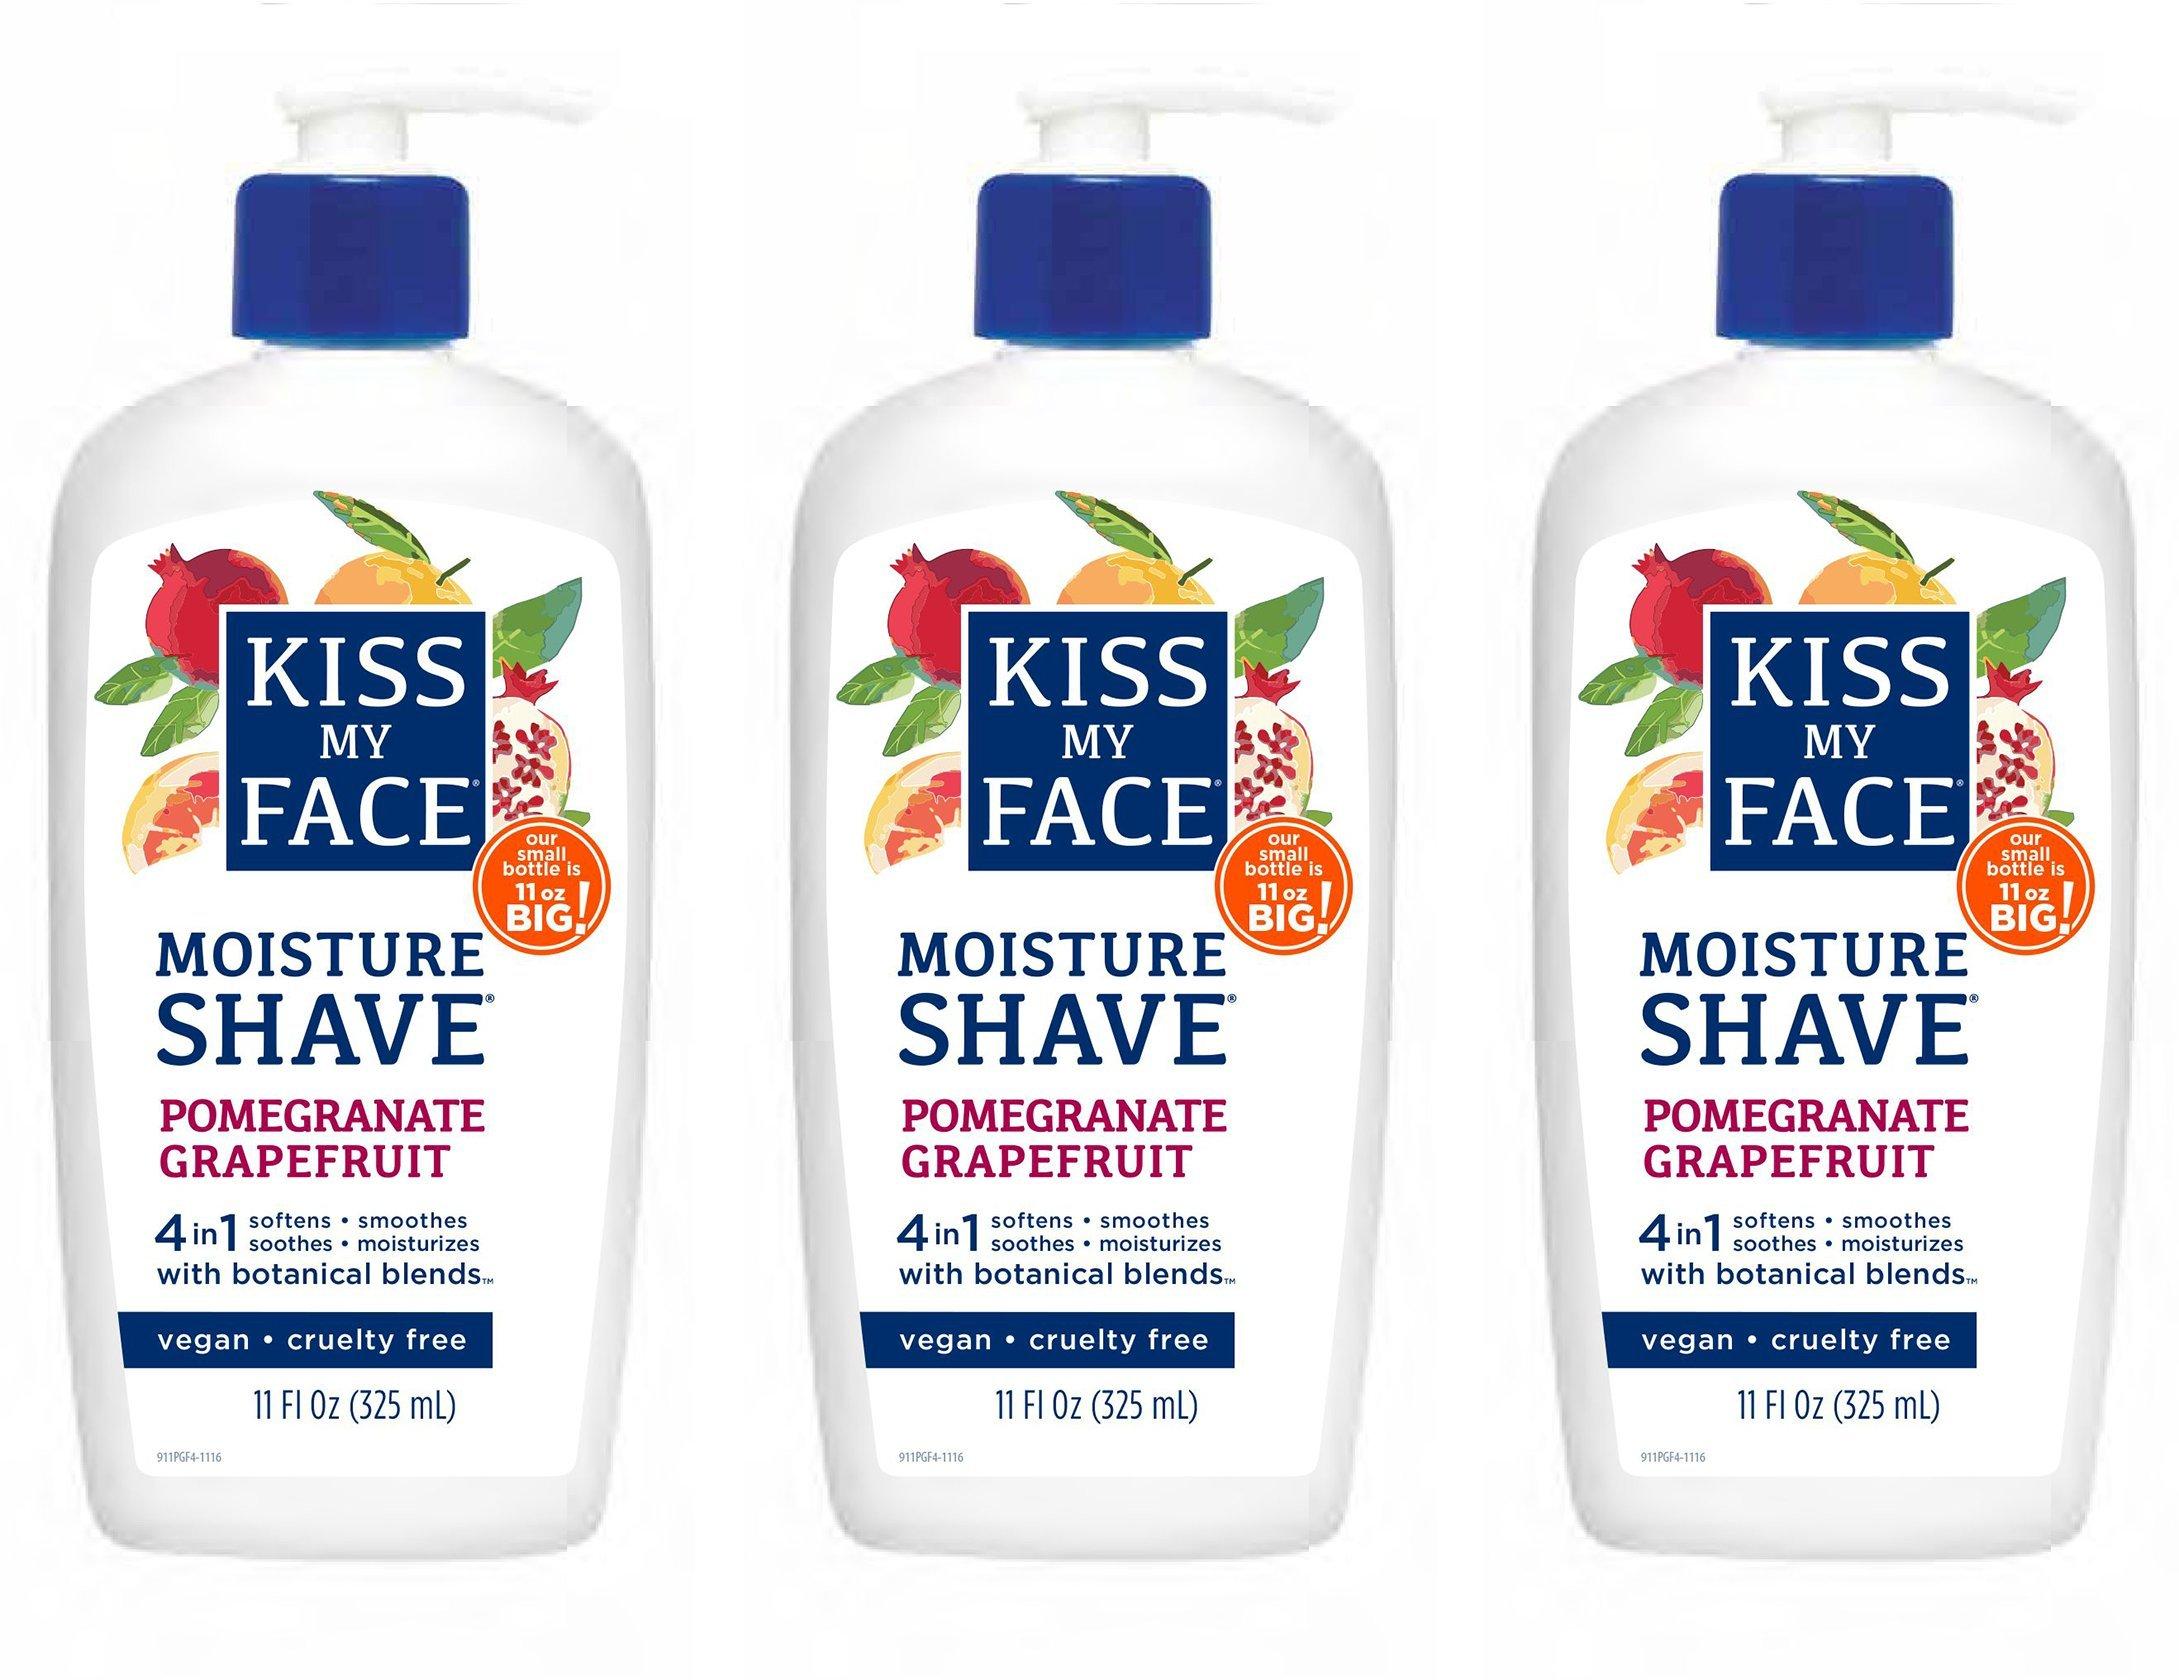 Kiss My Face Signature Bundles Moisture Shave Shaving Cream, Pomegranate Grapefruit Shaving Soap, 11oz, 3 Count